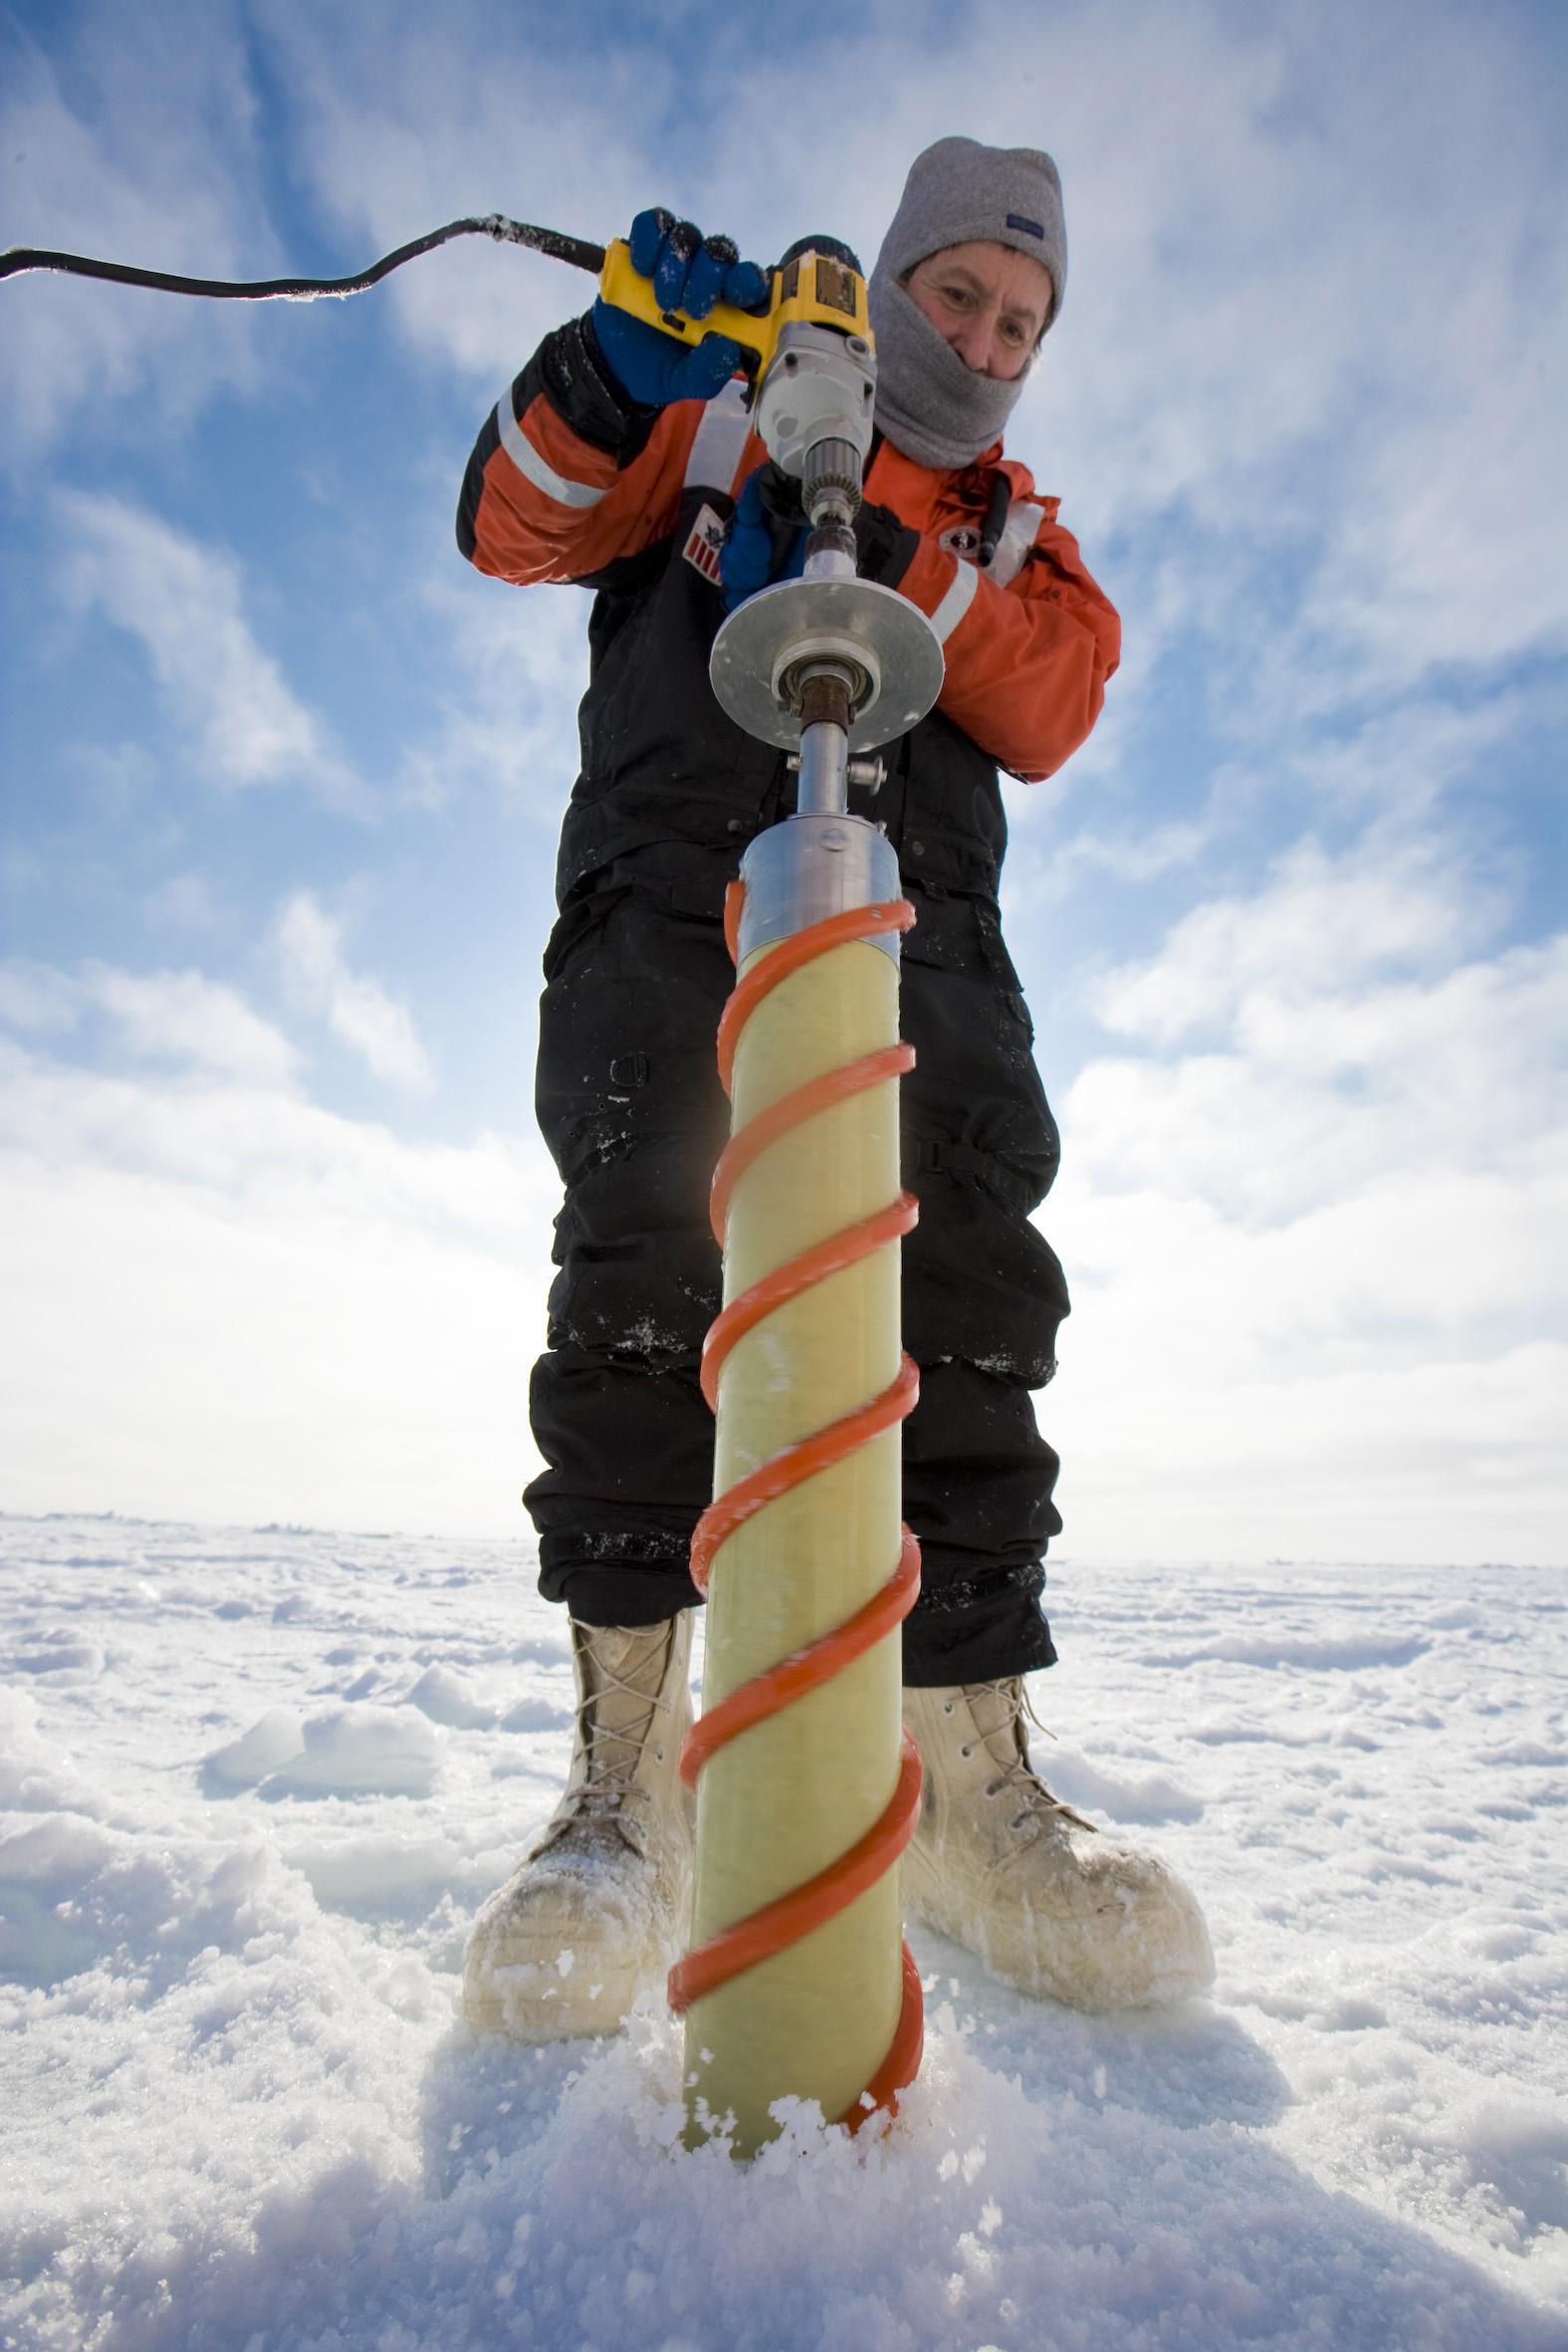 Rolf Gradinger tar isprøver på et forskningstokt i Polhavet. Foto: Christian Morel